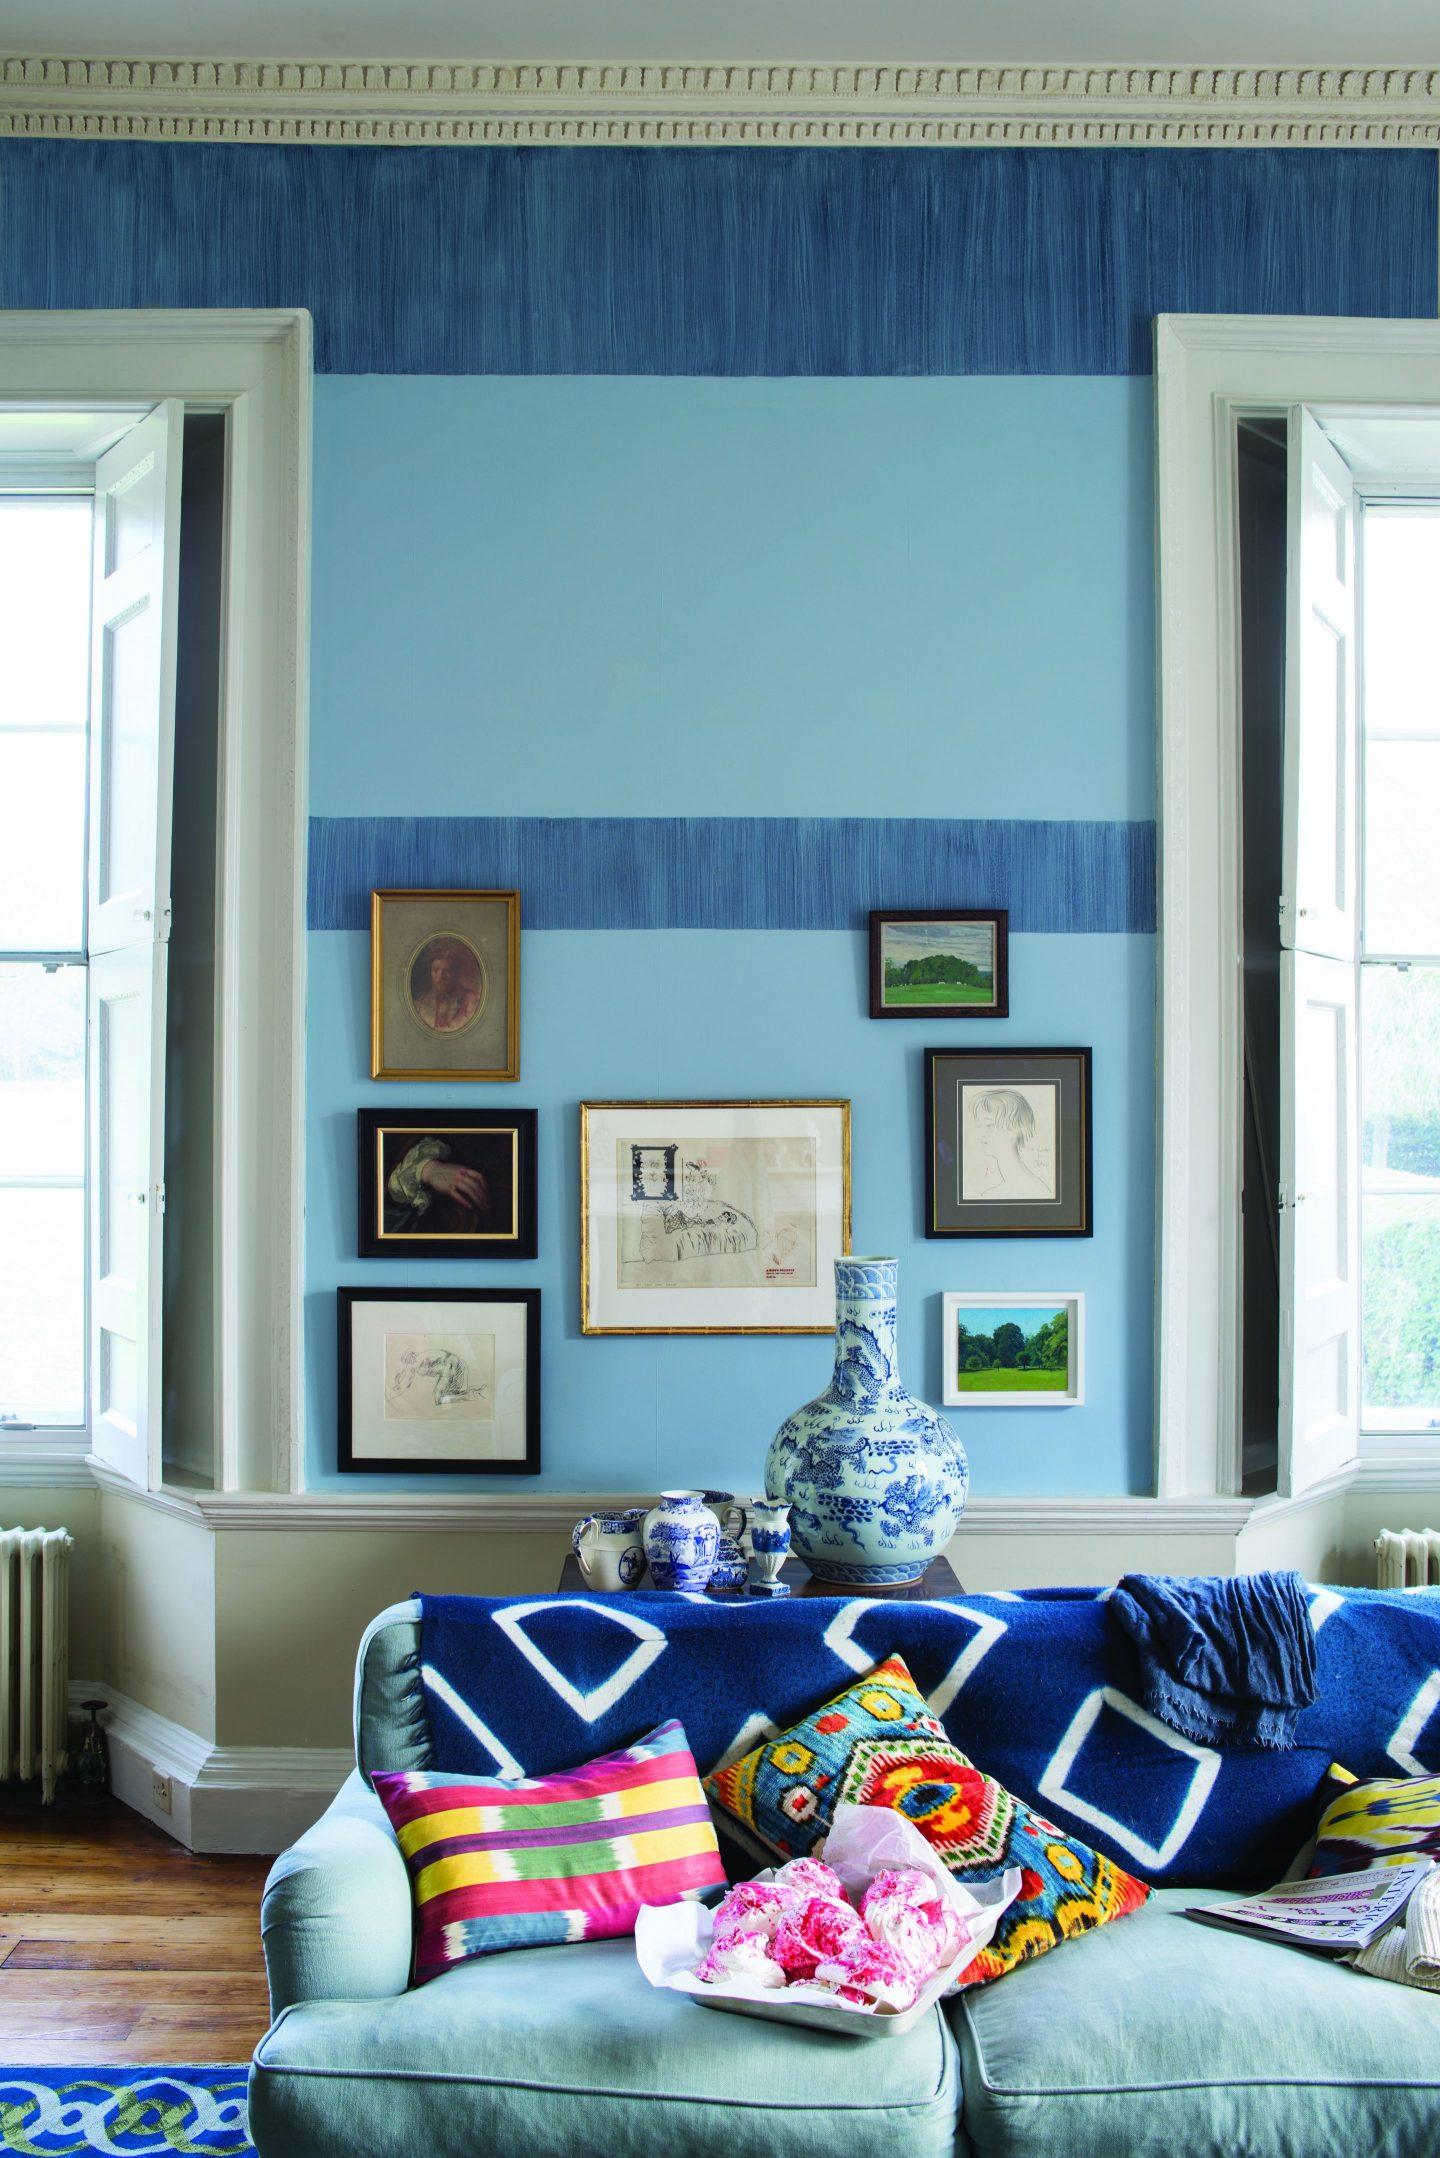 FarrowBall_1182390_PitchBlueandLulworthBlueLivingR.jpg-1440x2158 Paint Inspiration: 20 Colorful Rooms We Love